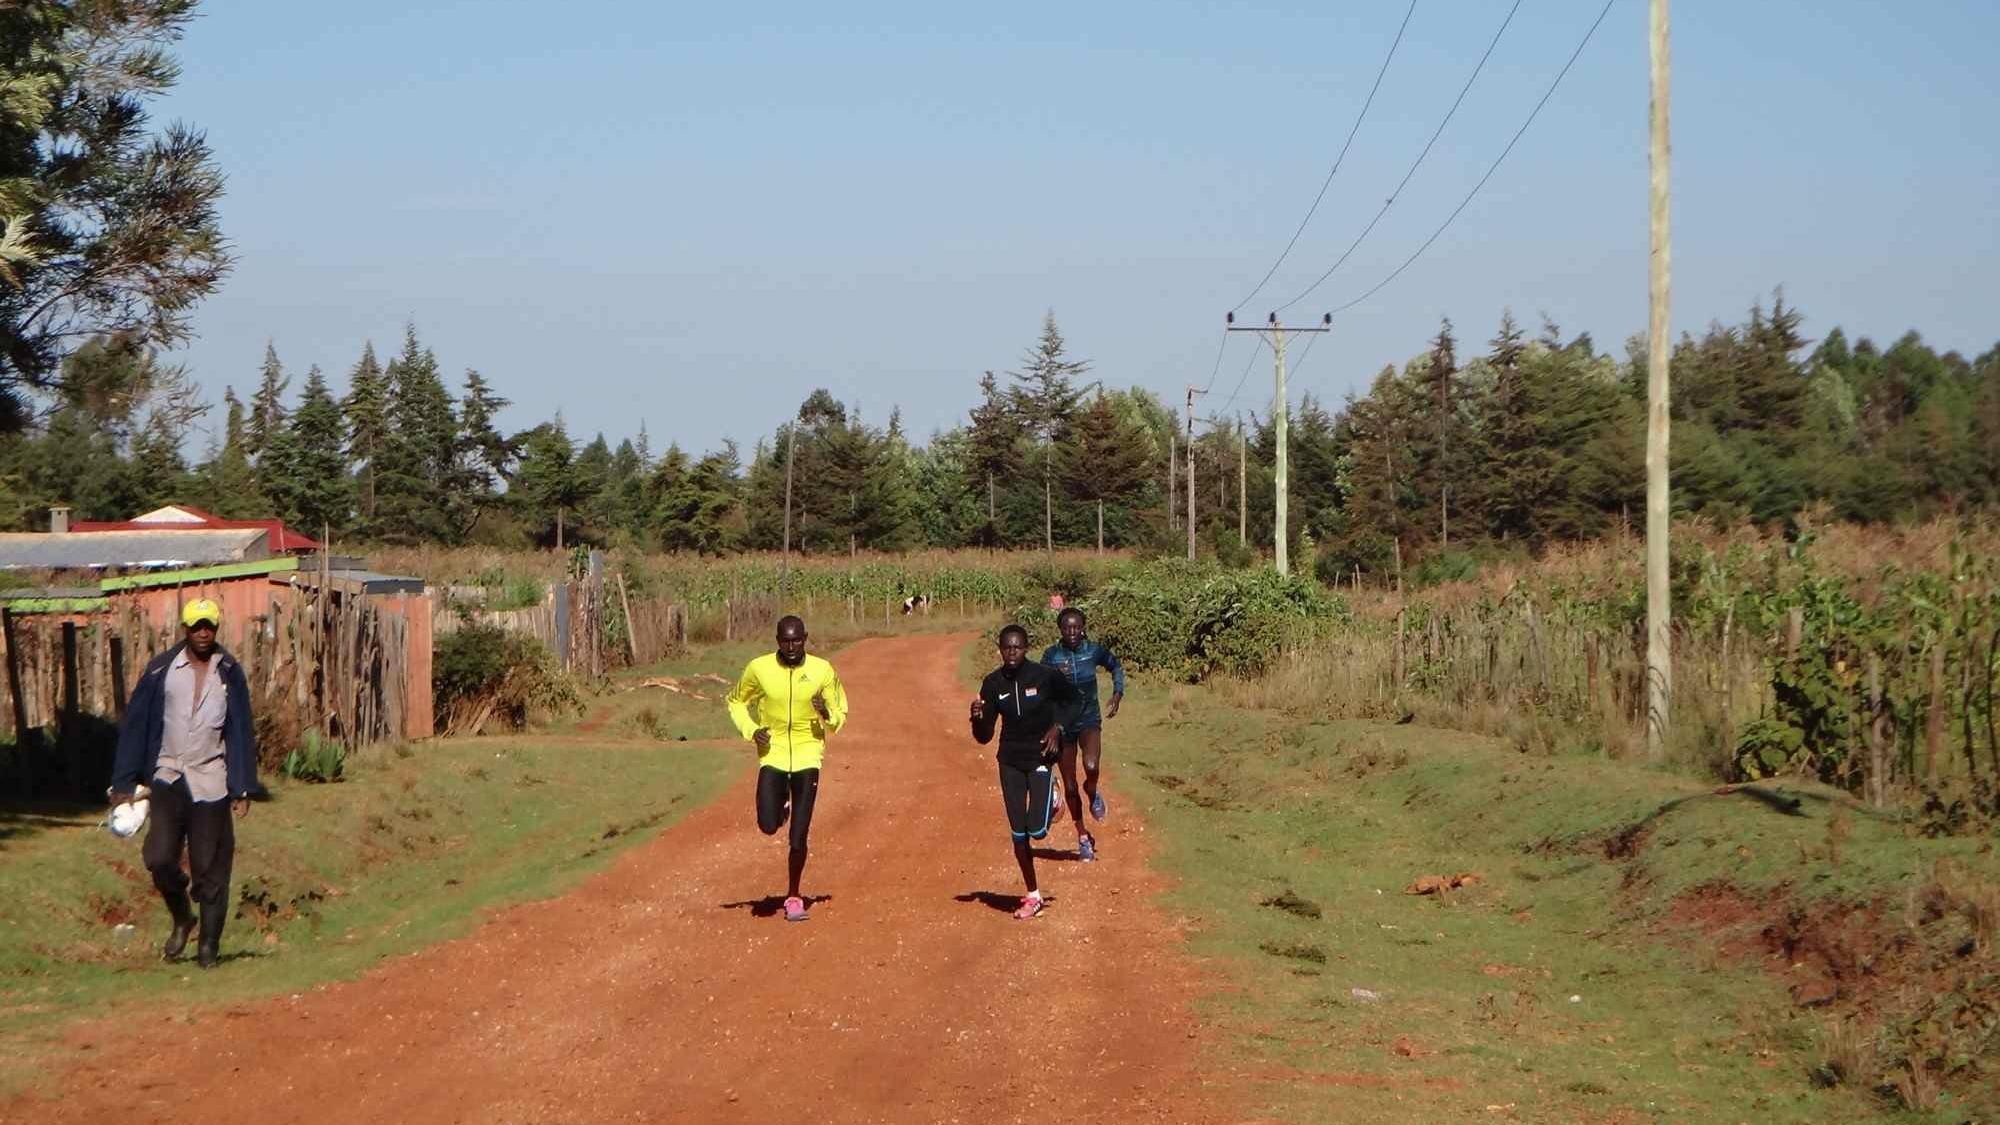 35km 장거리주 끝 지점에 도착하는 헬라와 에드나 ©김성우